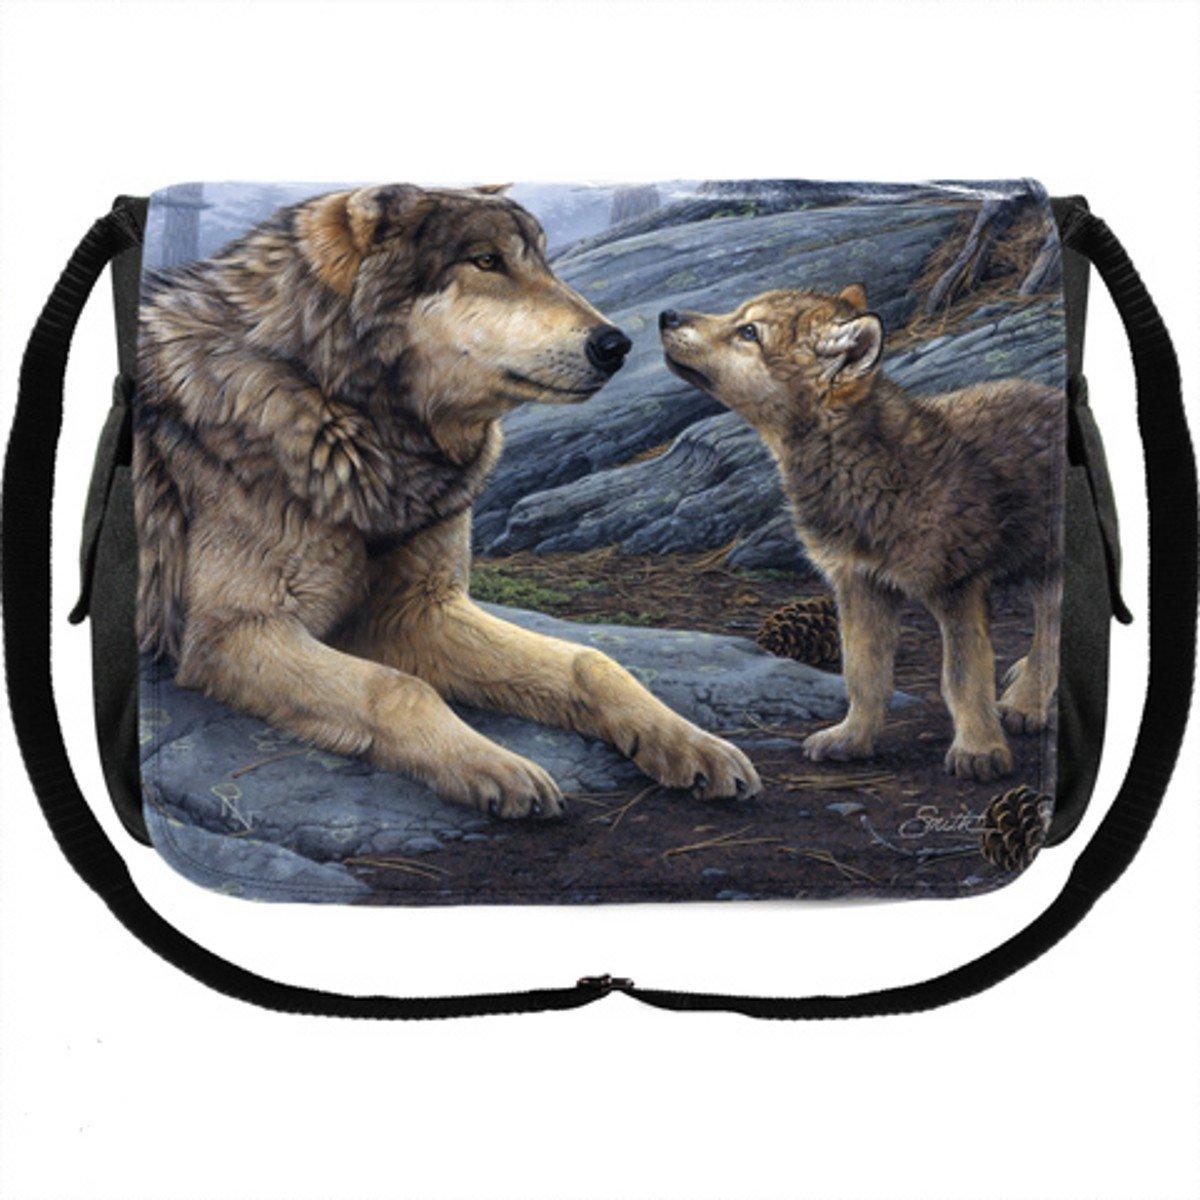 Dark Dreams Gothic Wicca Pagan Hexe Magier Magier Magier Tasche Messenger Bag Wolf Wölfe d93a11